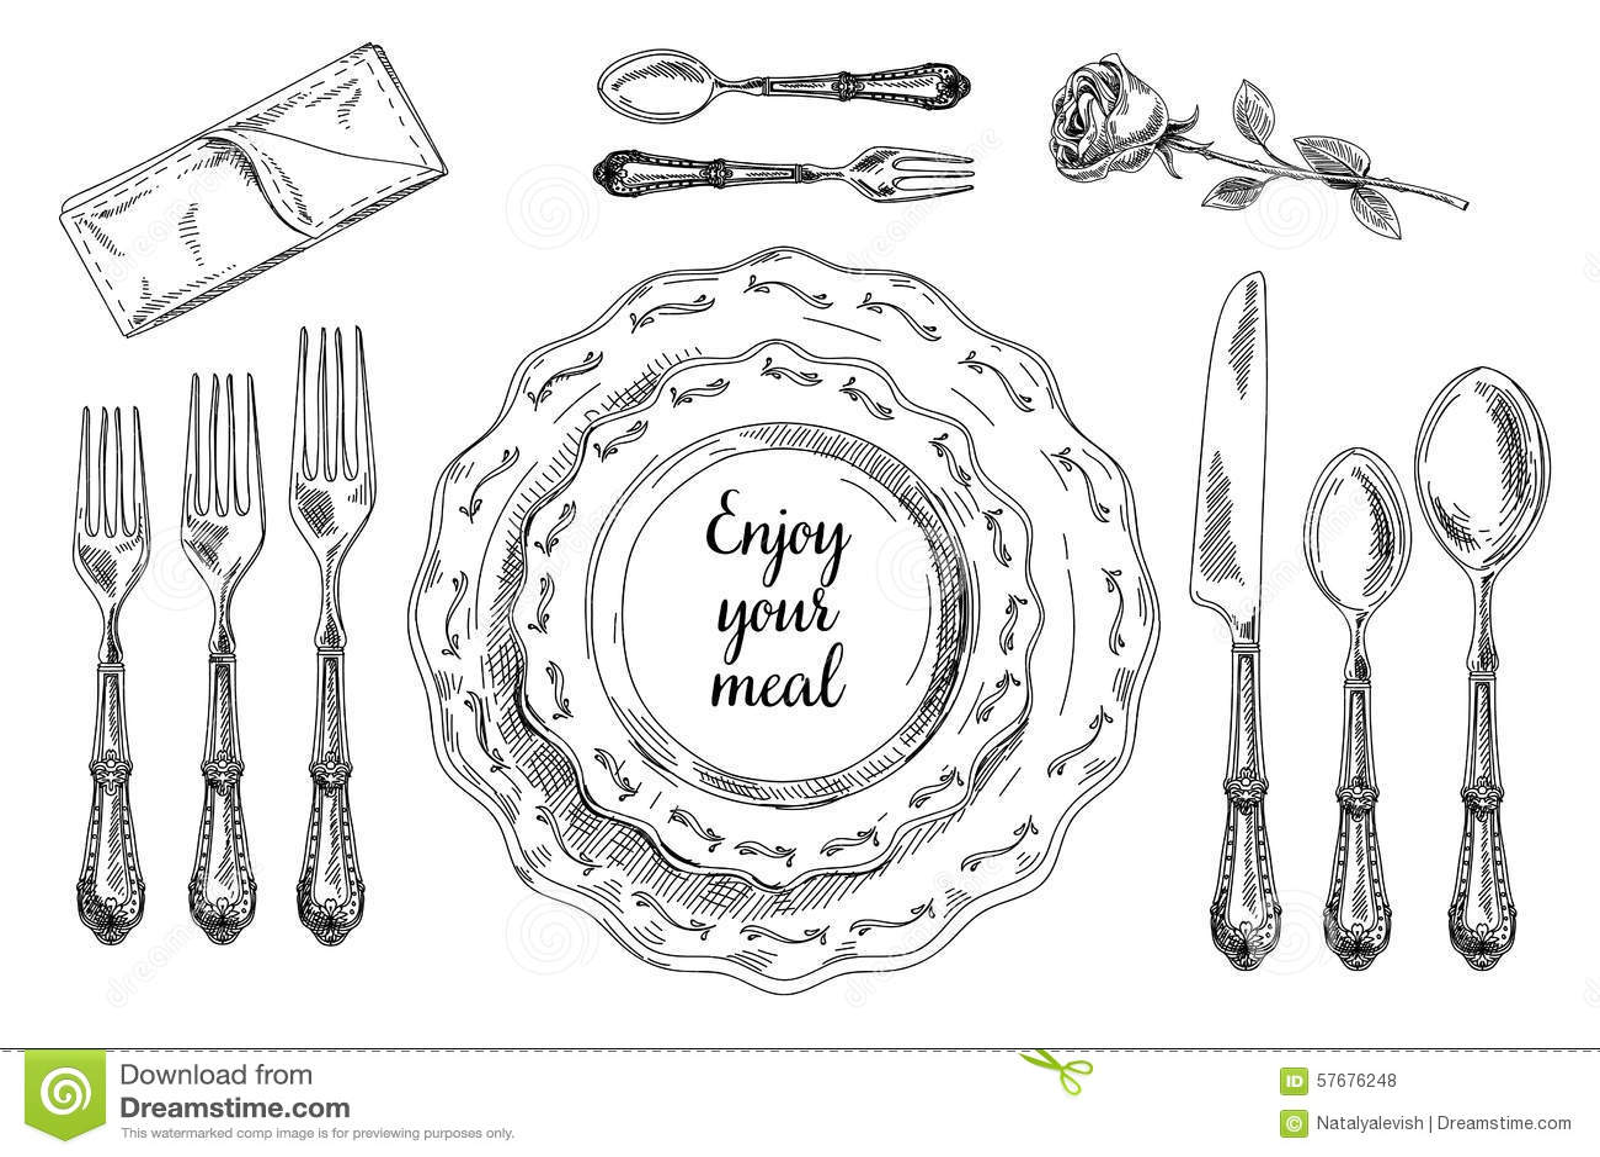 Kitchen Design Tool Free 1. Image Result For Kitchen Design Tool Free 1